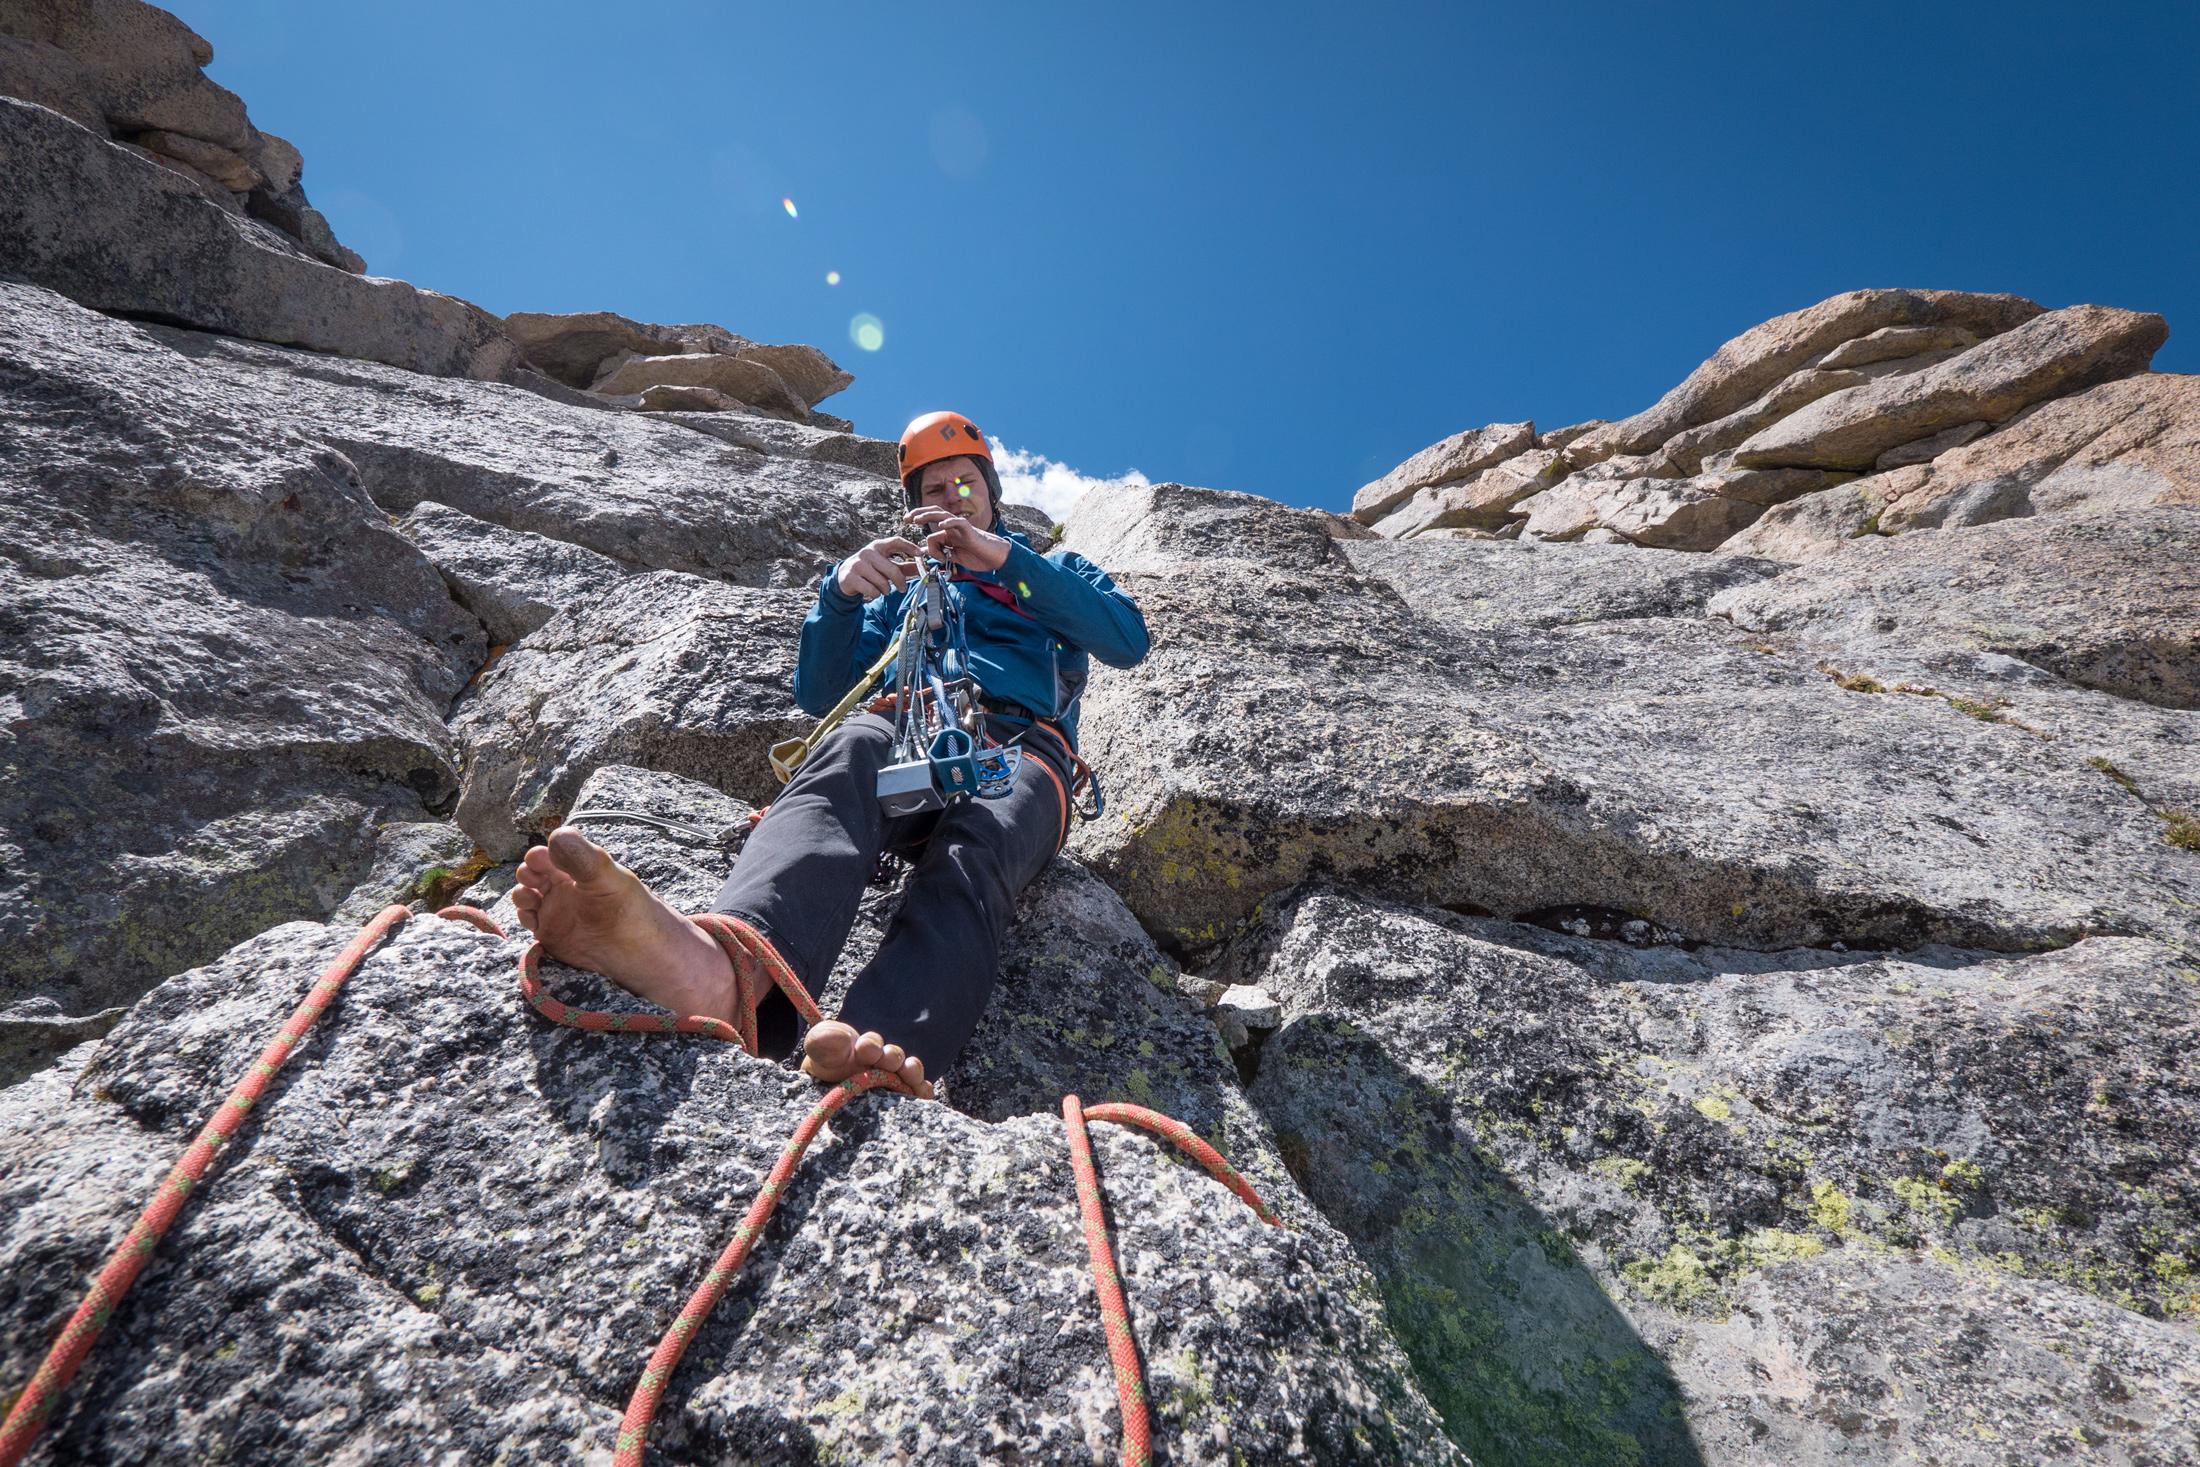 colorado-climbing-2017-1030479-web.jpg